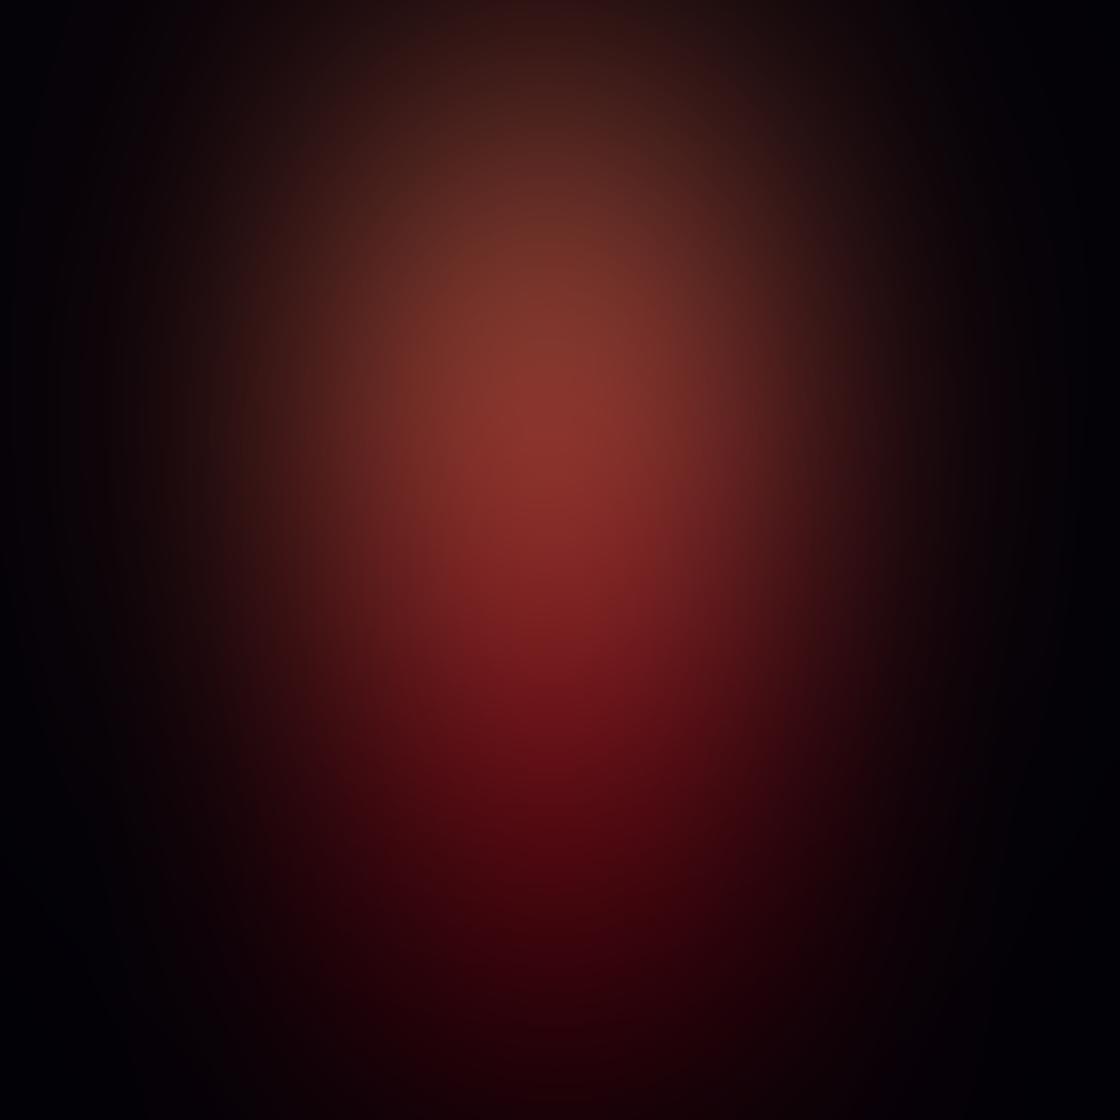 Common iPhone Photo Mistakes 9